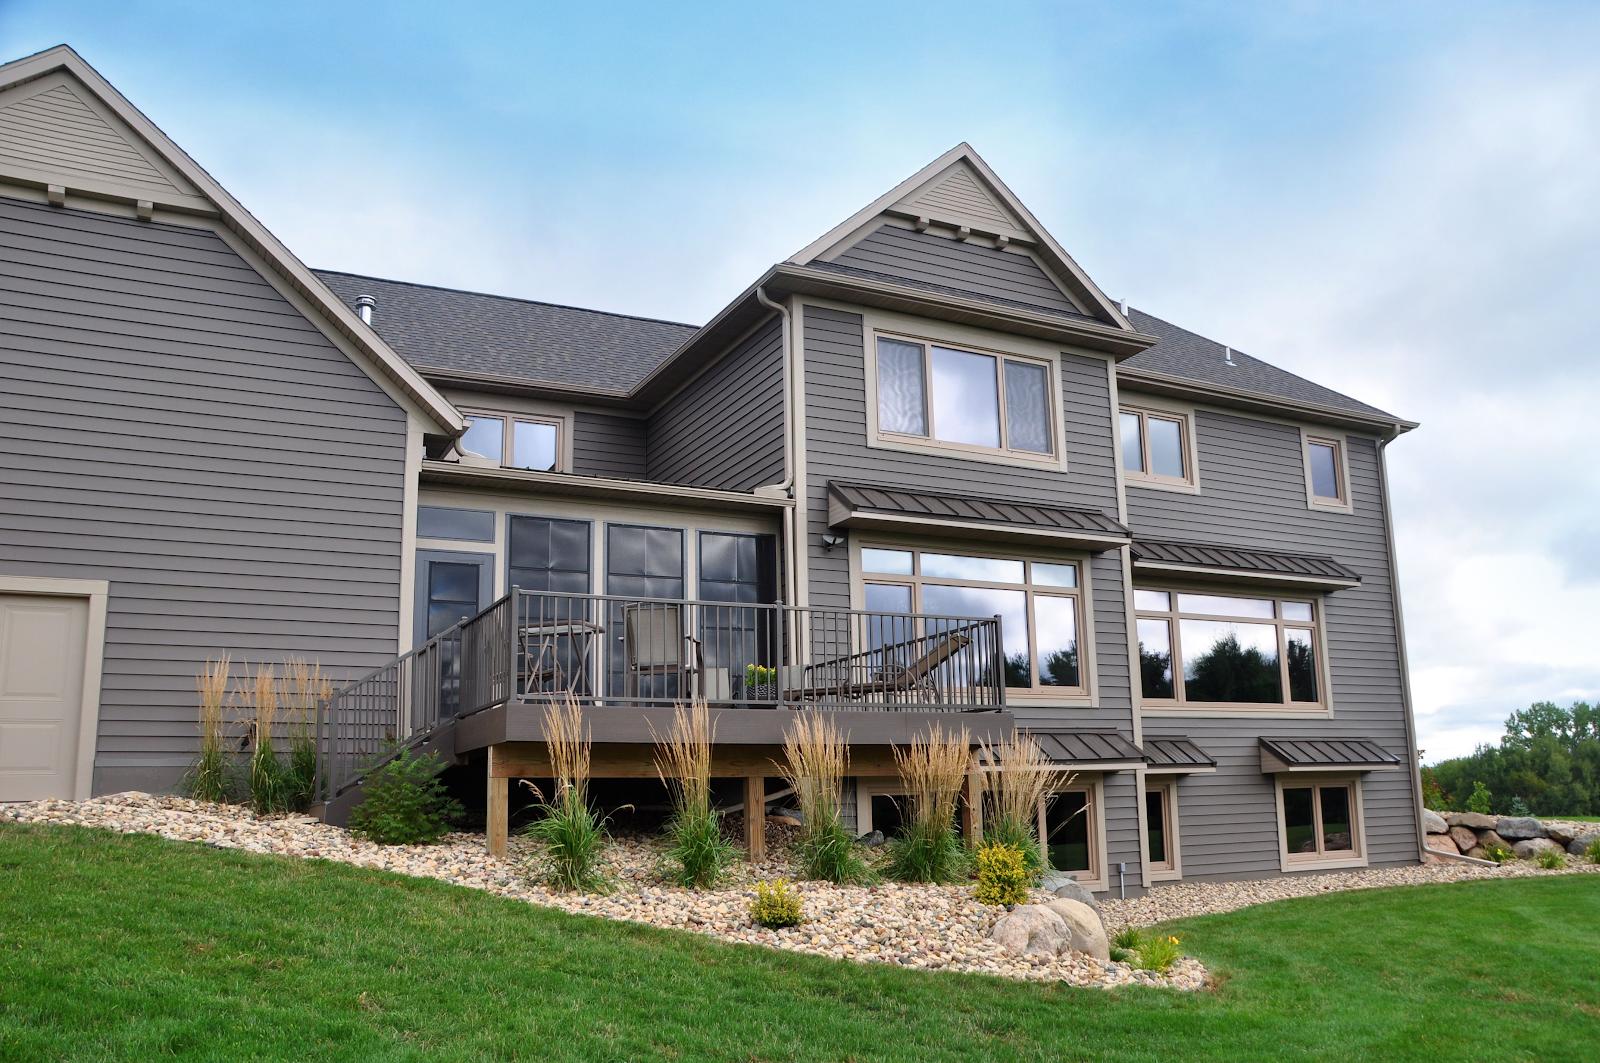 residential exterior siding history